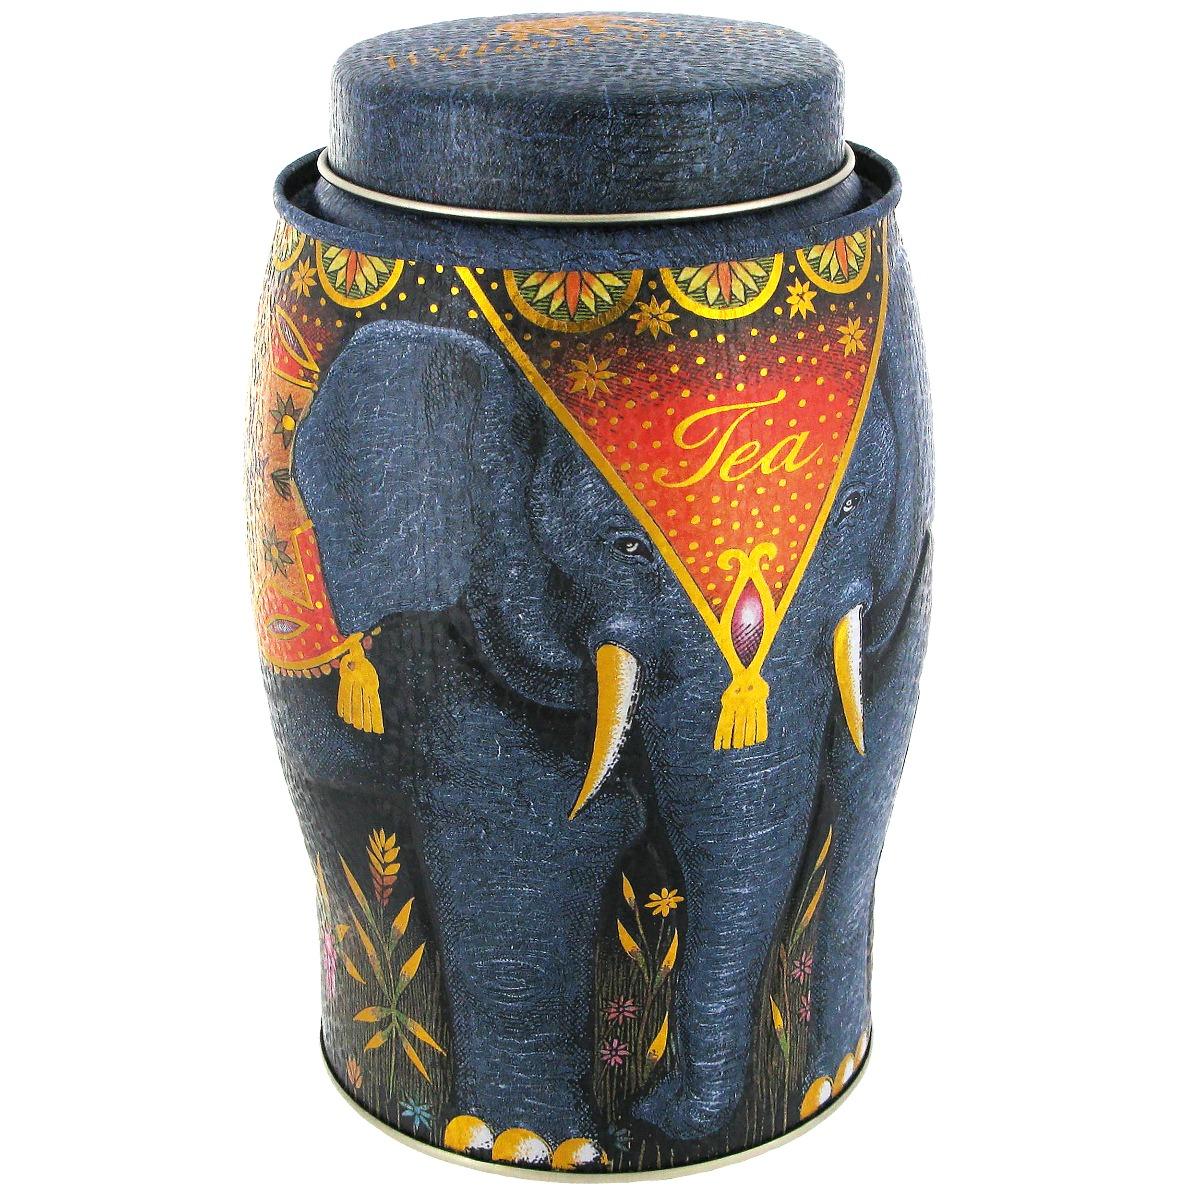 Elephant tea caddy with English Breakfast tea (dark grey)